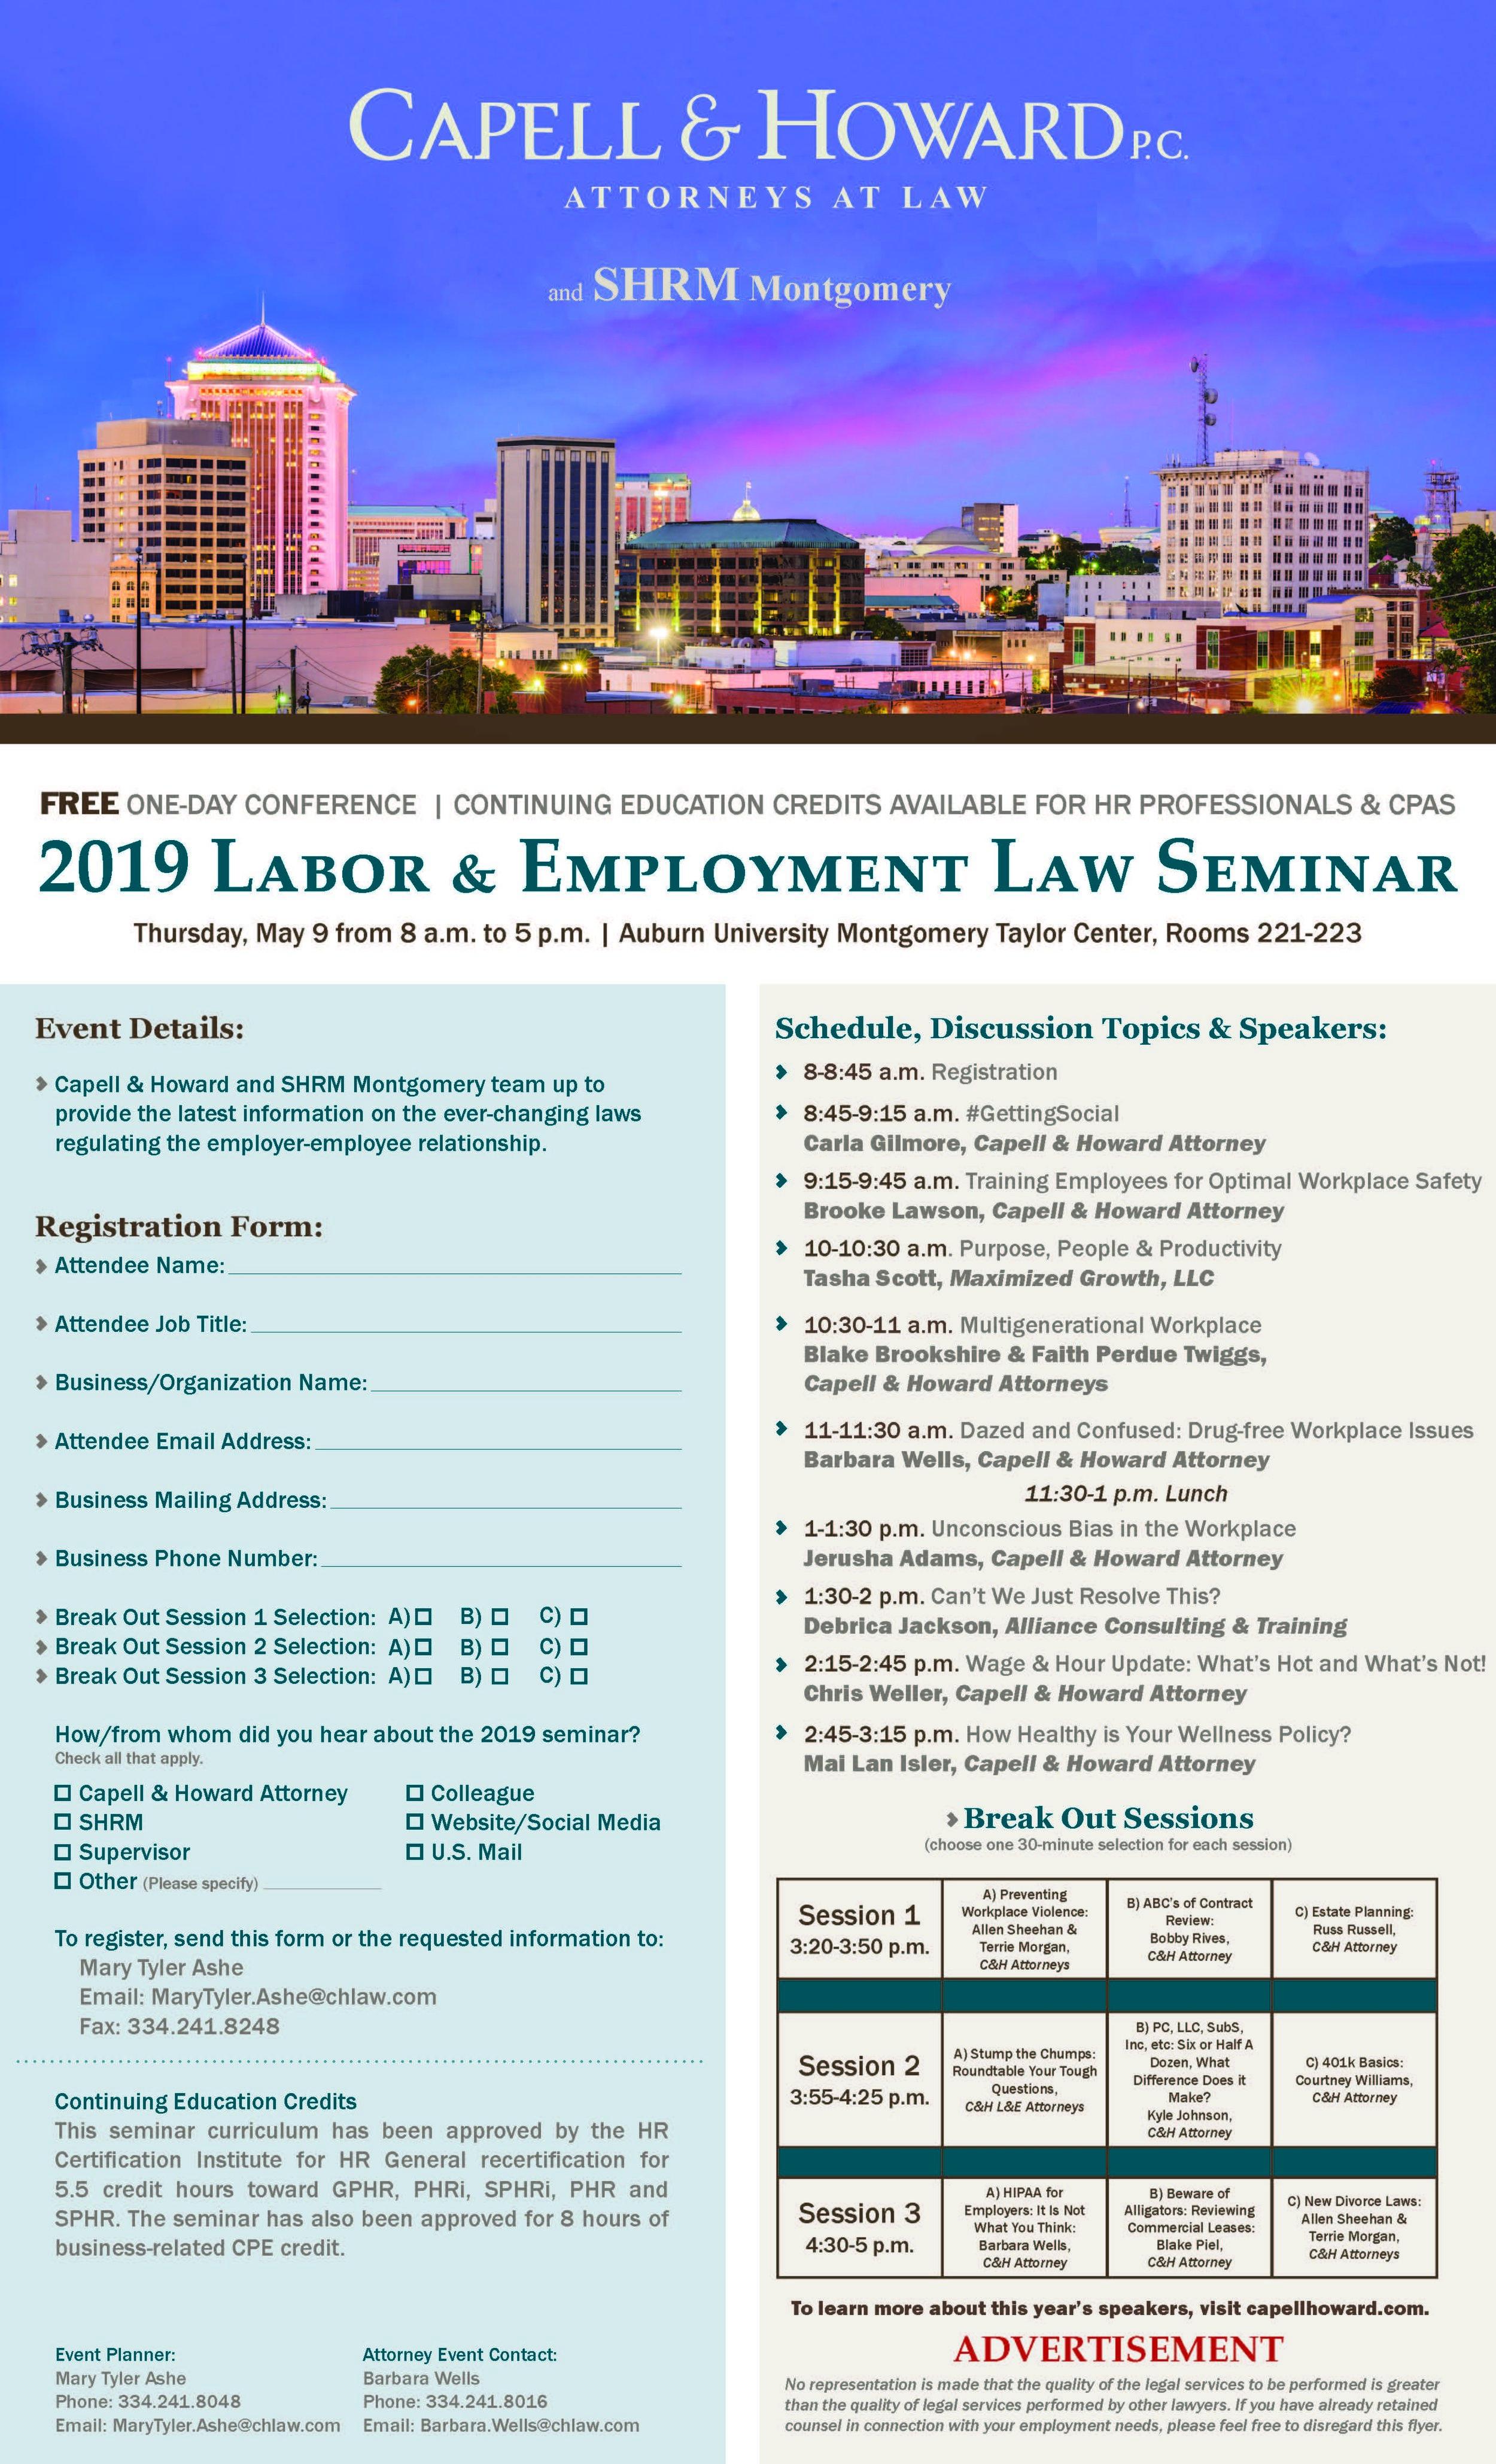 2019 Labor and Employment Law Seminar Flyer FINAL.jpg